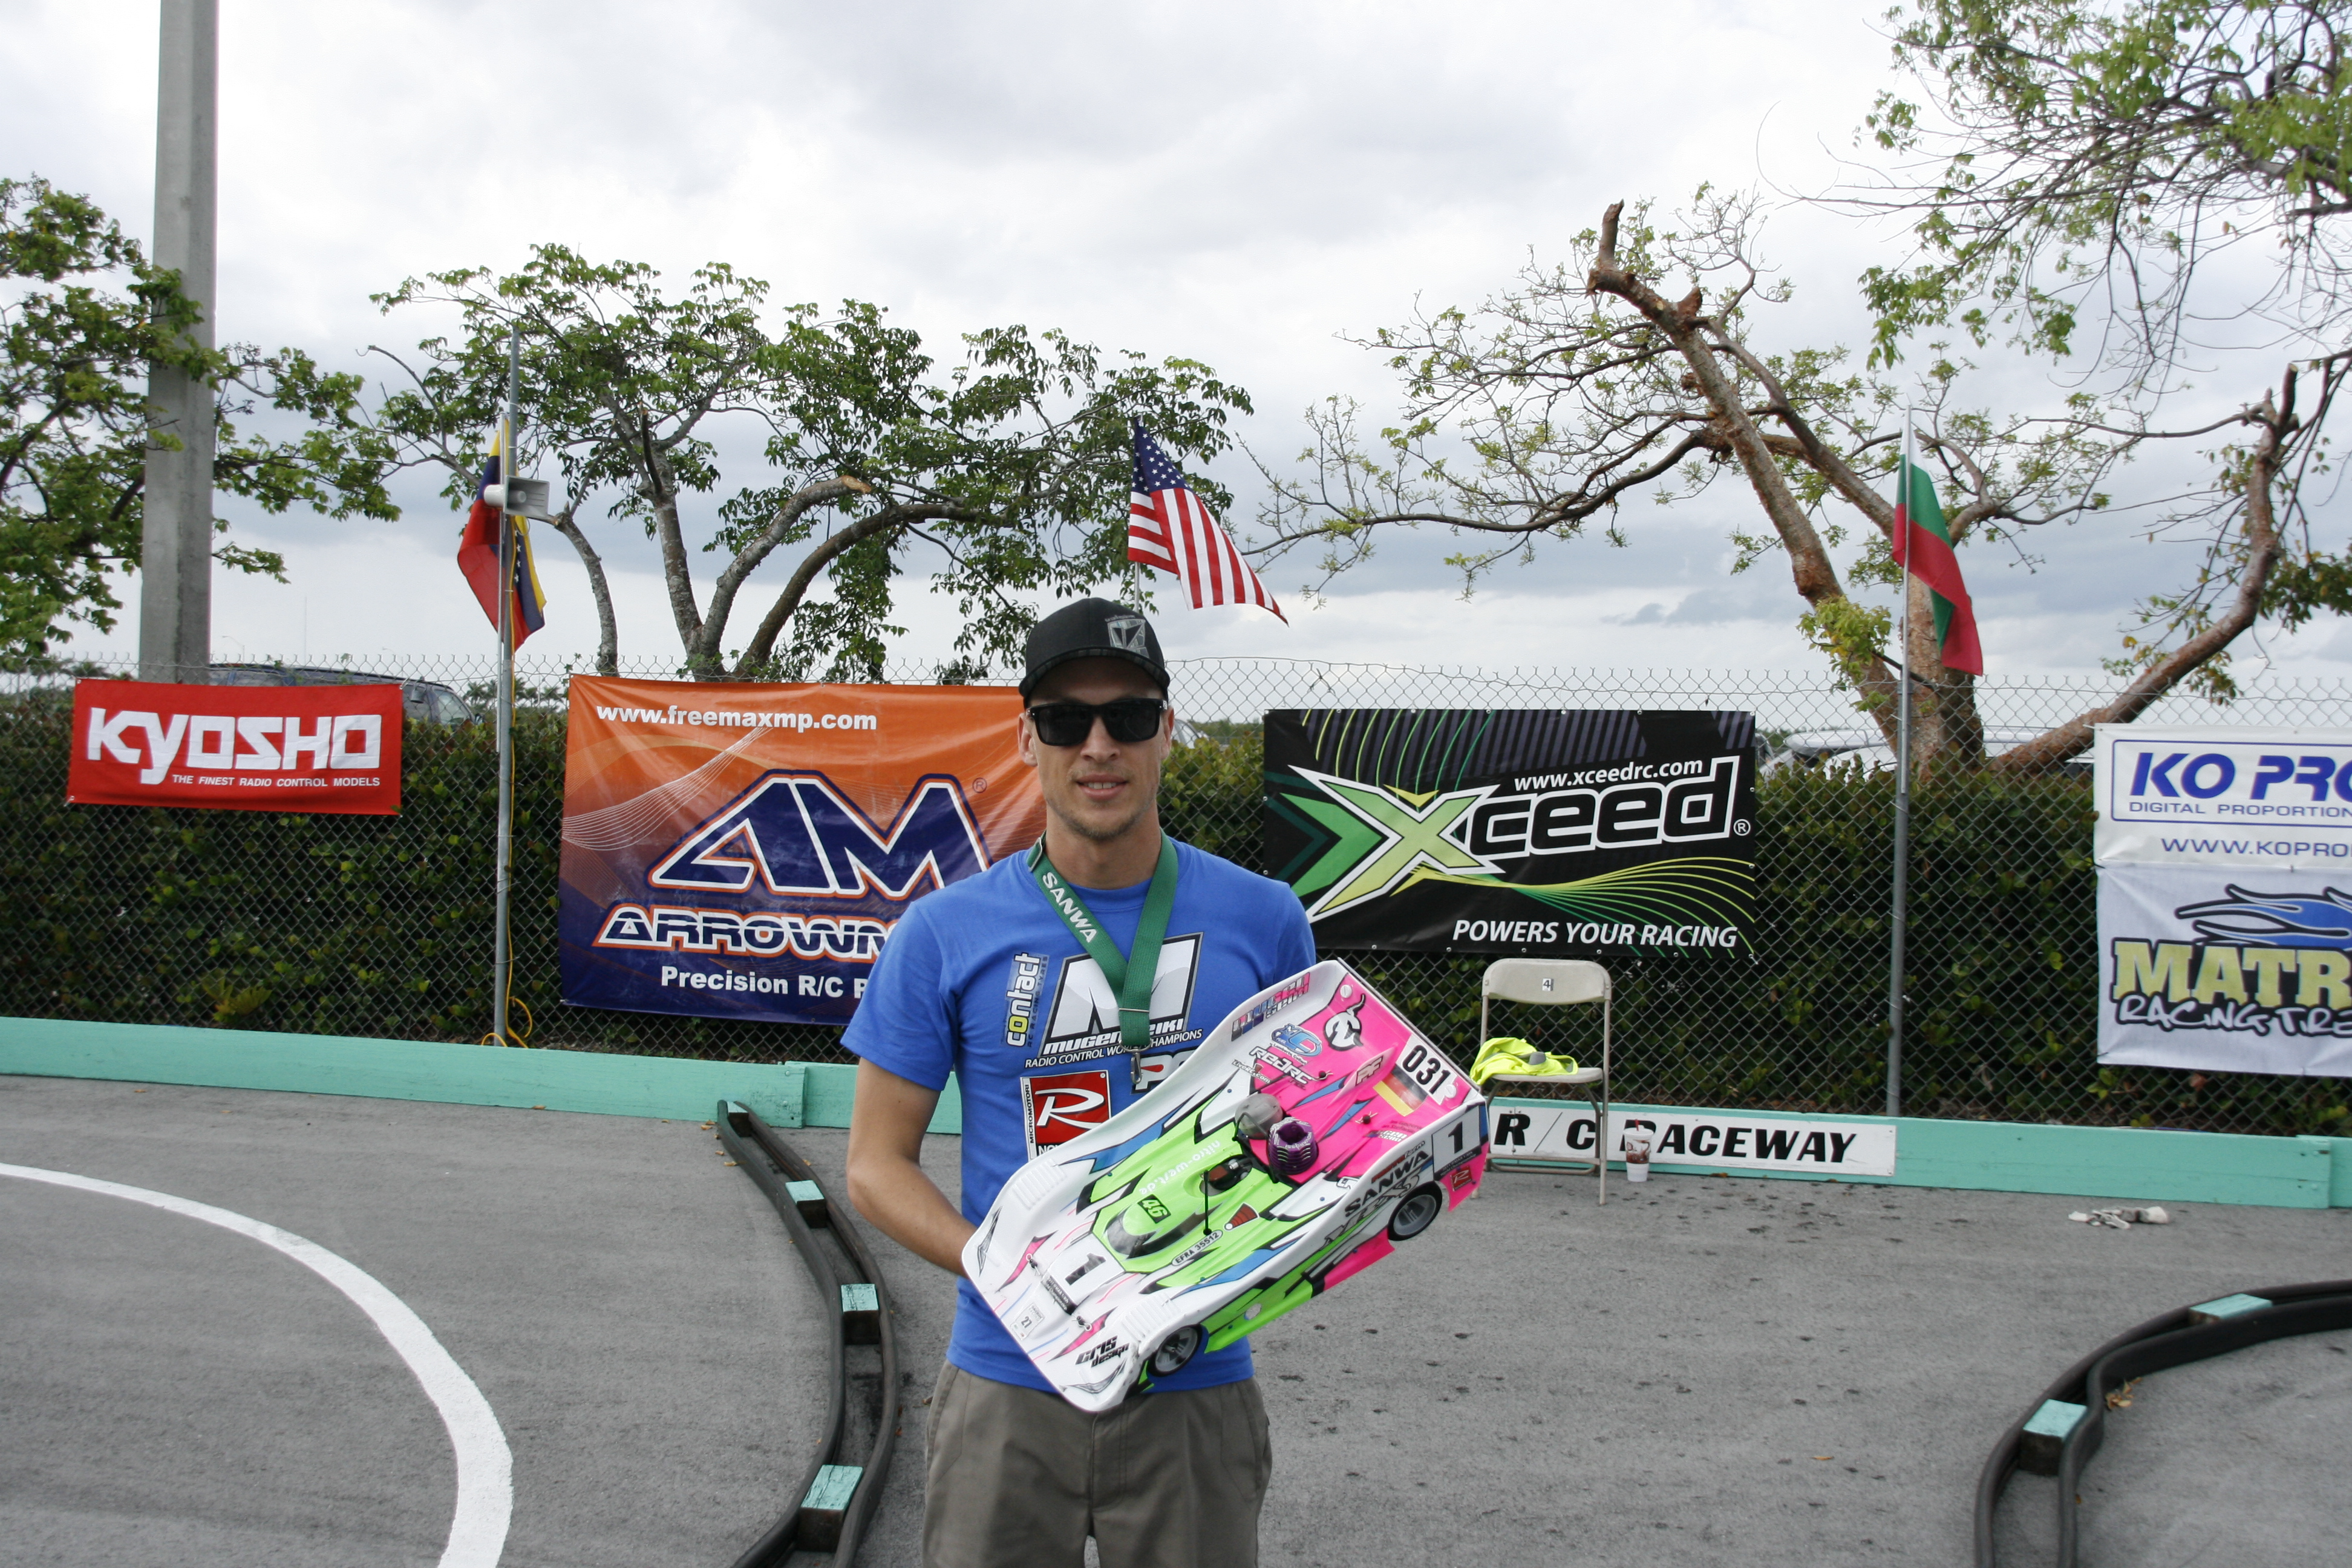 Robert Pietsch & Mugen Win 1/8-scale On-road World Championship